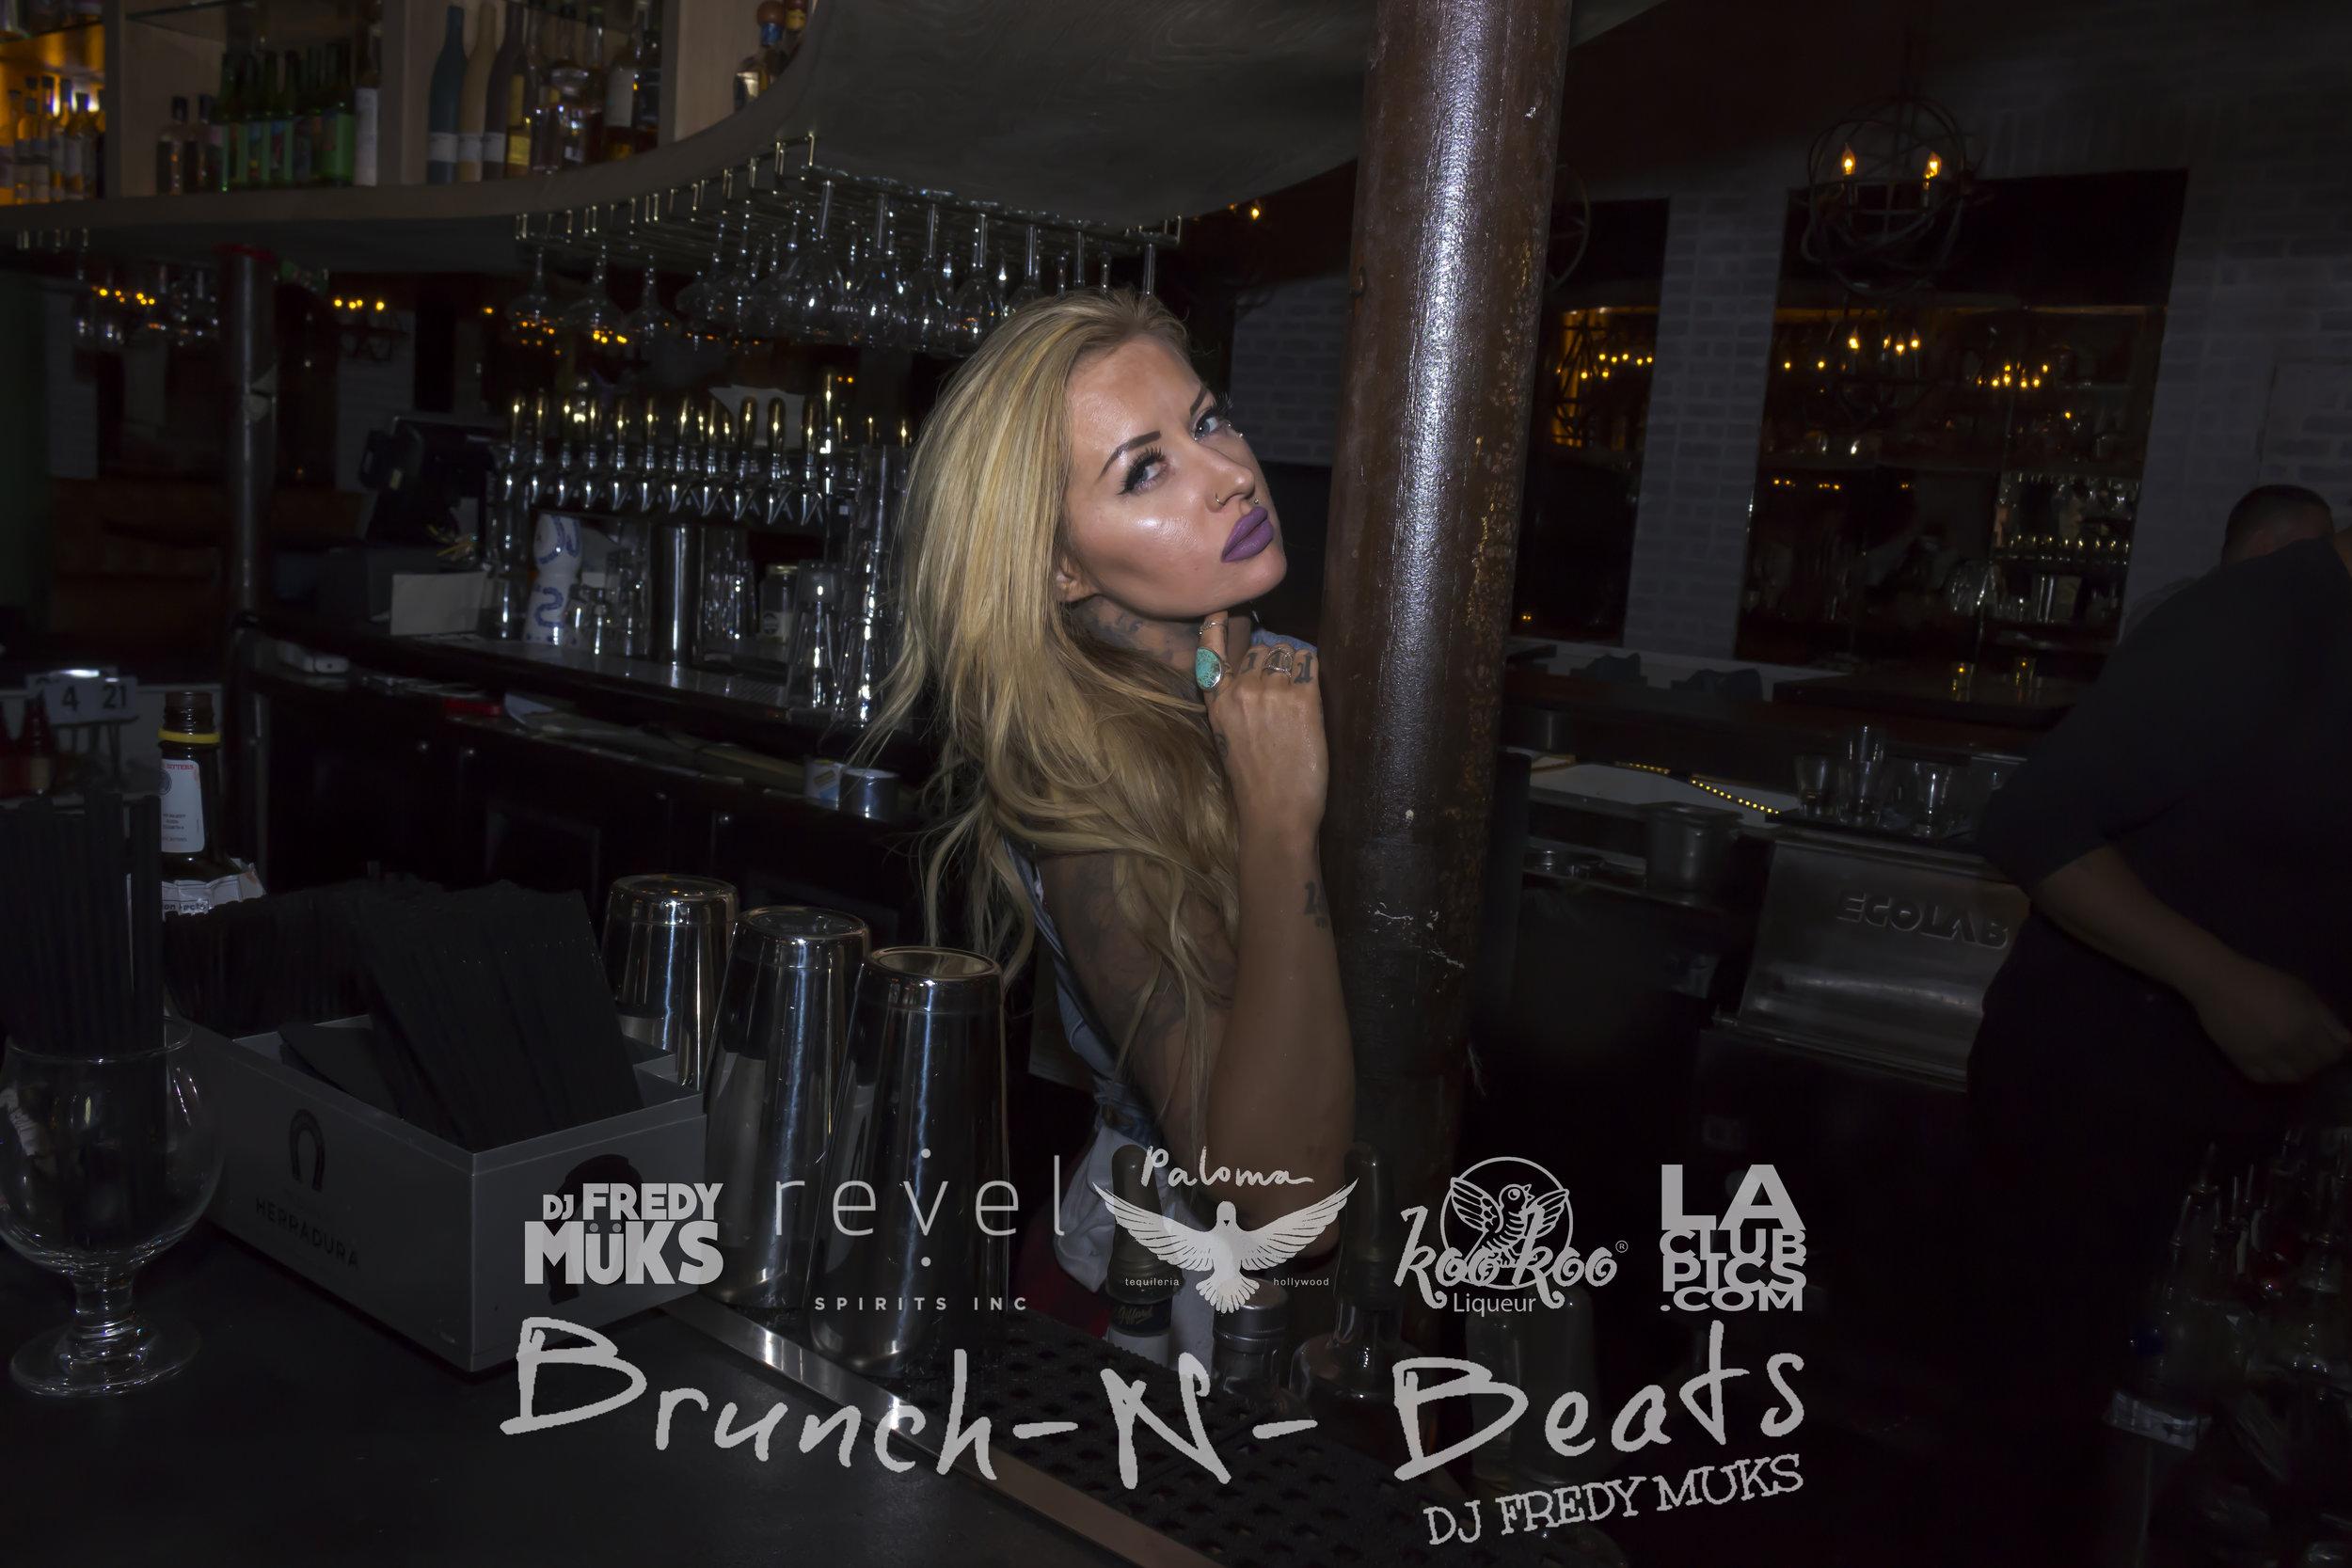 Brunch-N-Beats - Paloma Hollywood - 02-25-18_159.jpg